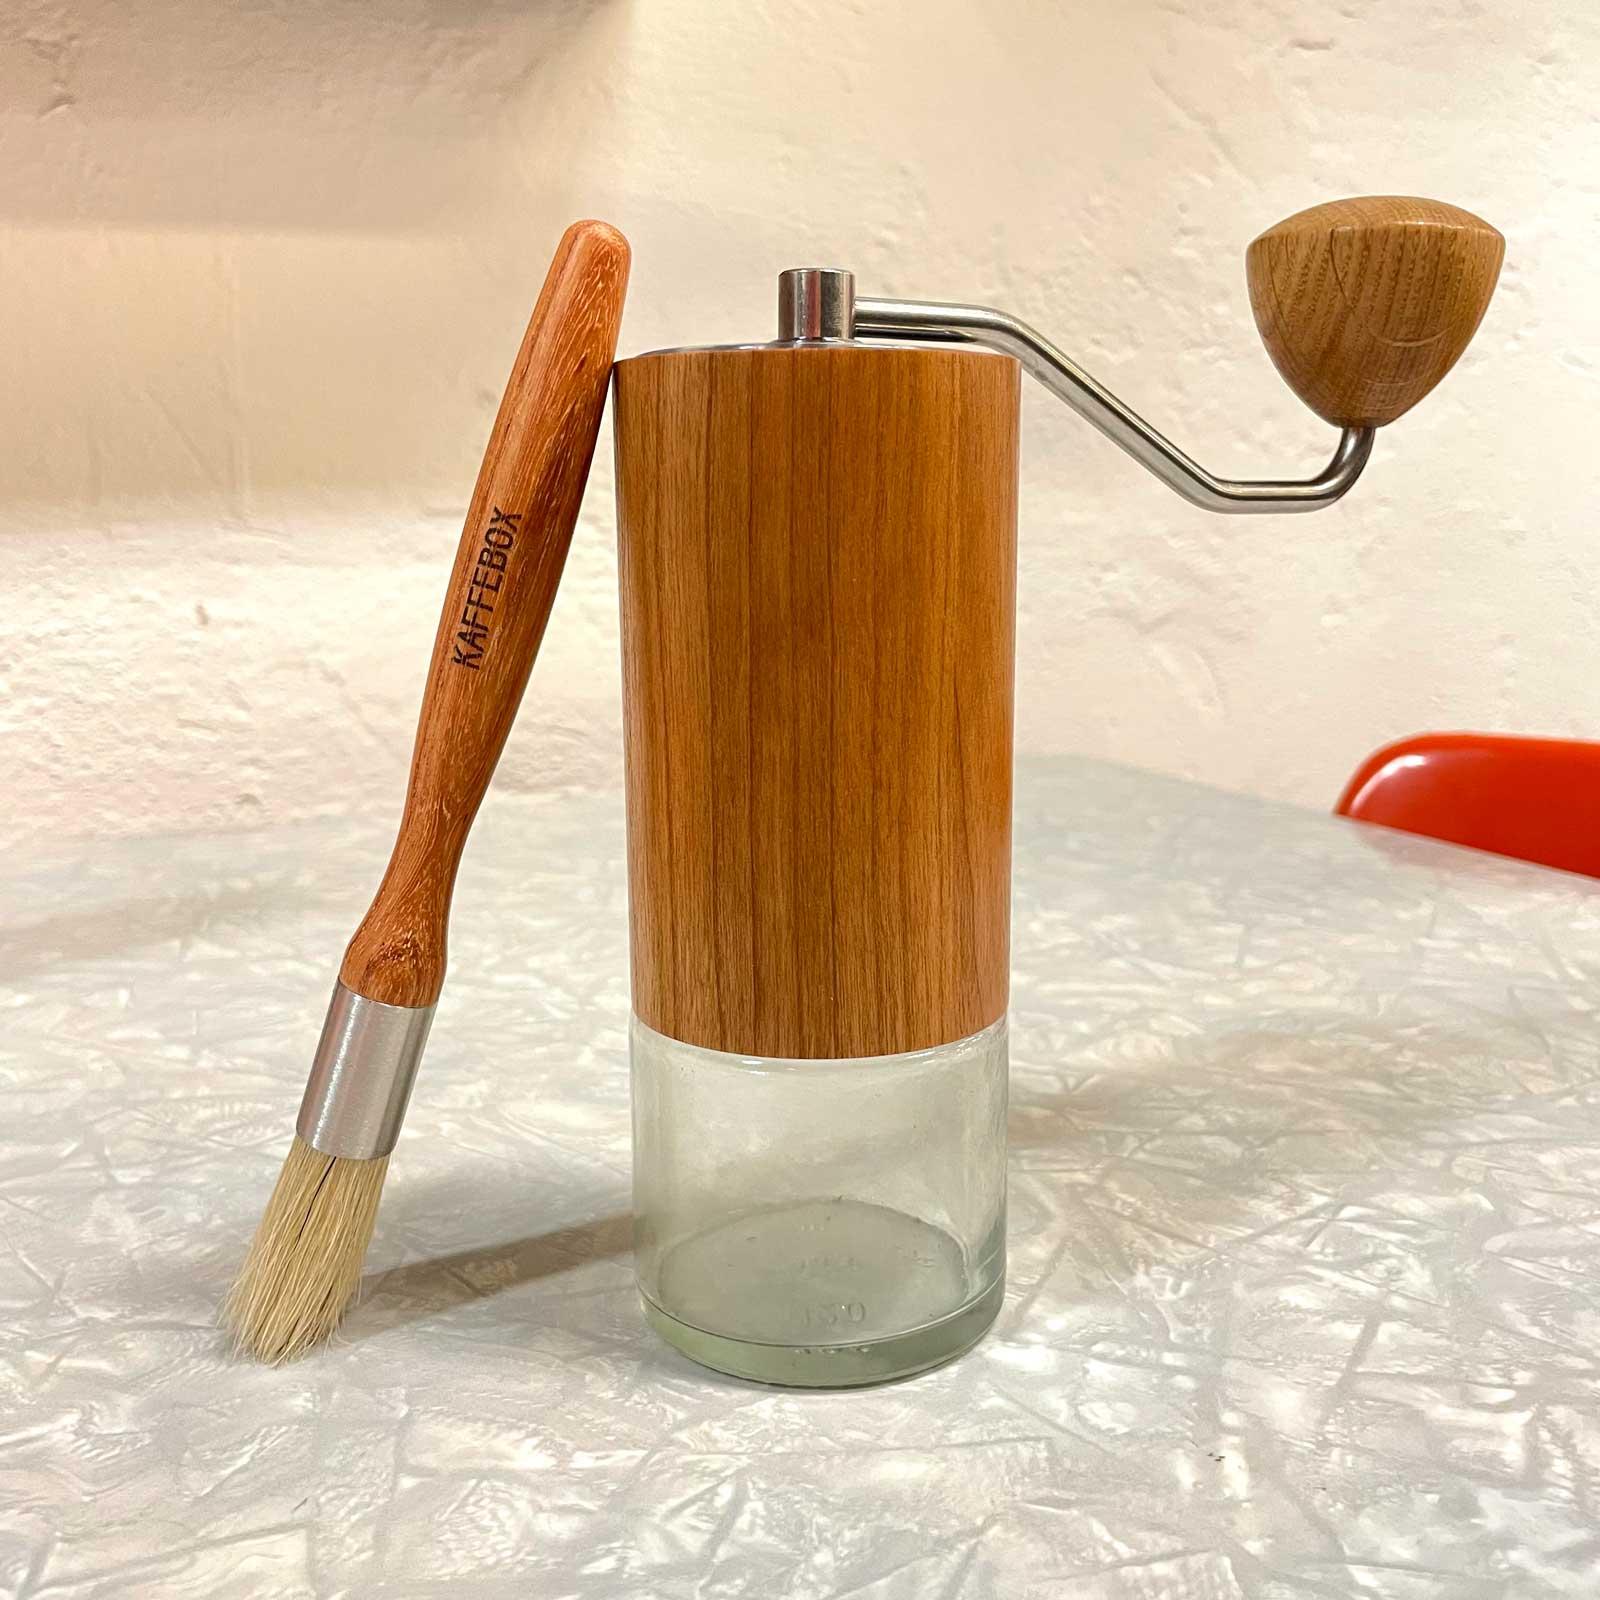 KaffeBox Barista Brush - Rengjøringsbørste til kvern